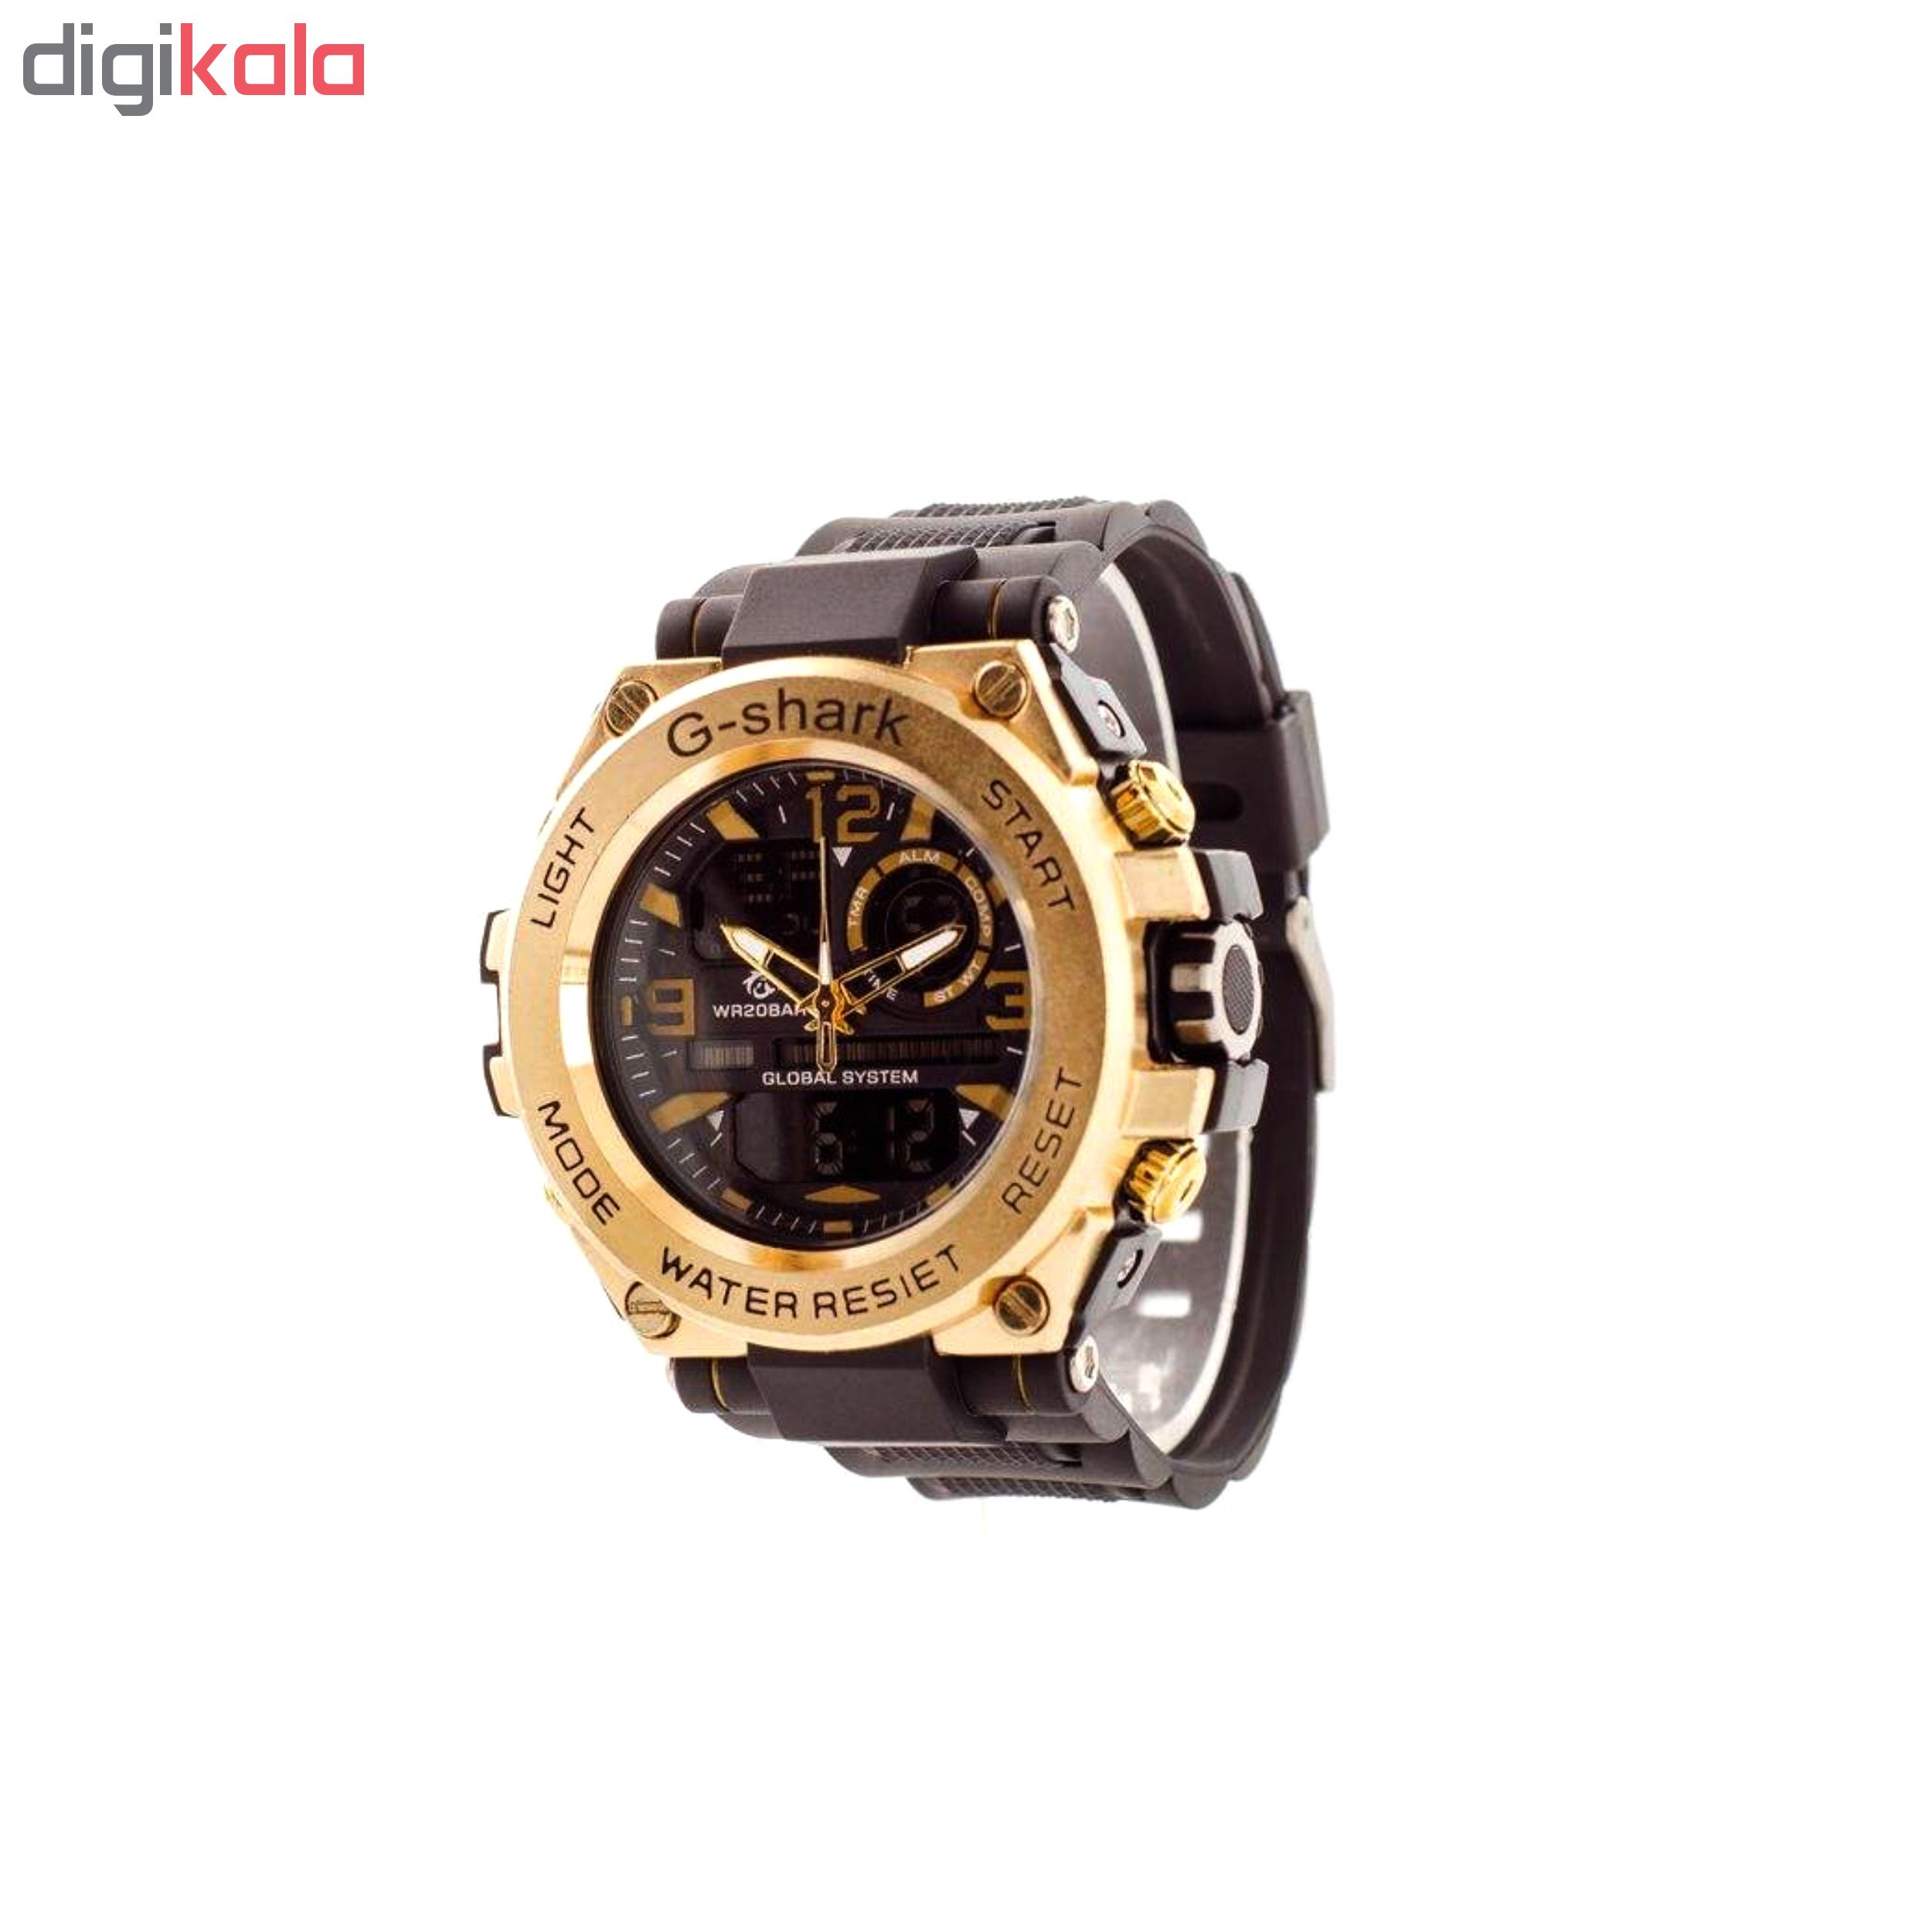 خرید اینترنتی                     ساعت مچی دیجیتال مردانه جی شارک کد G-SHARK-TL